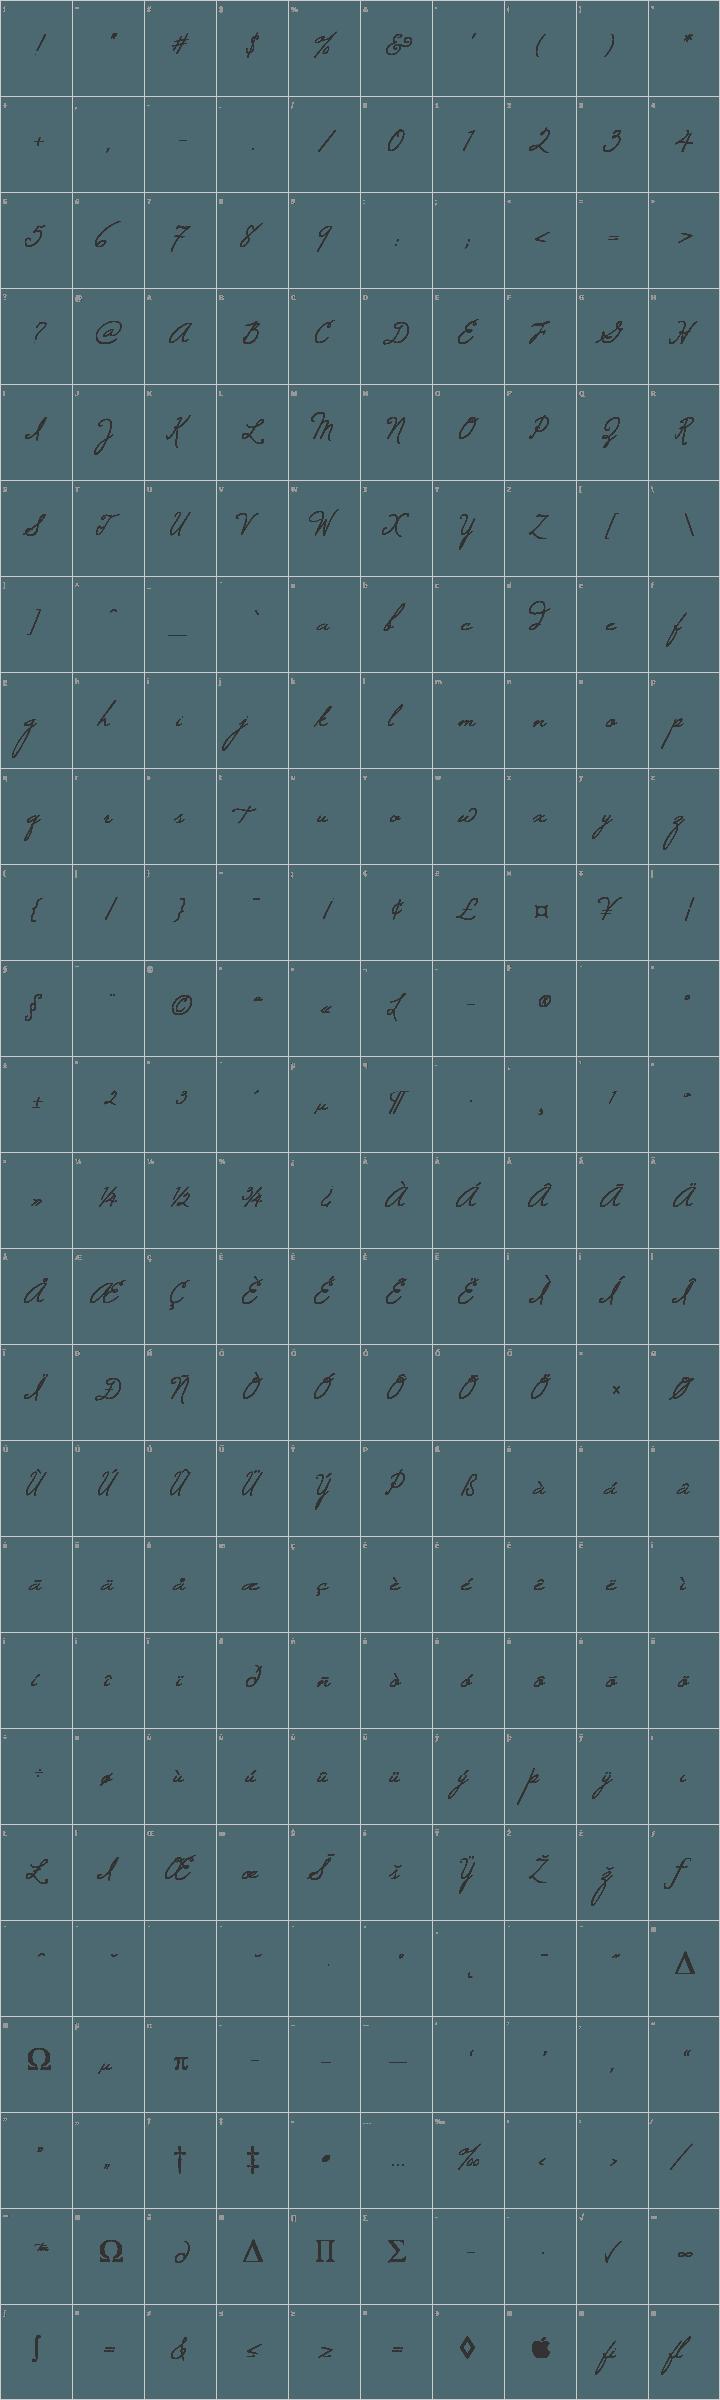 Windsong Glyph Map